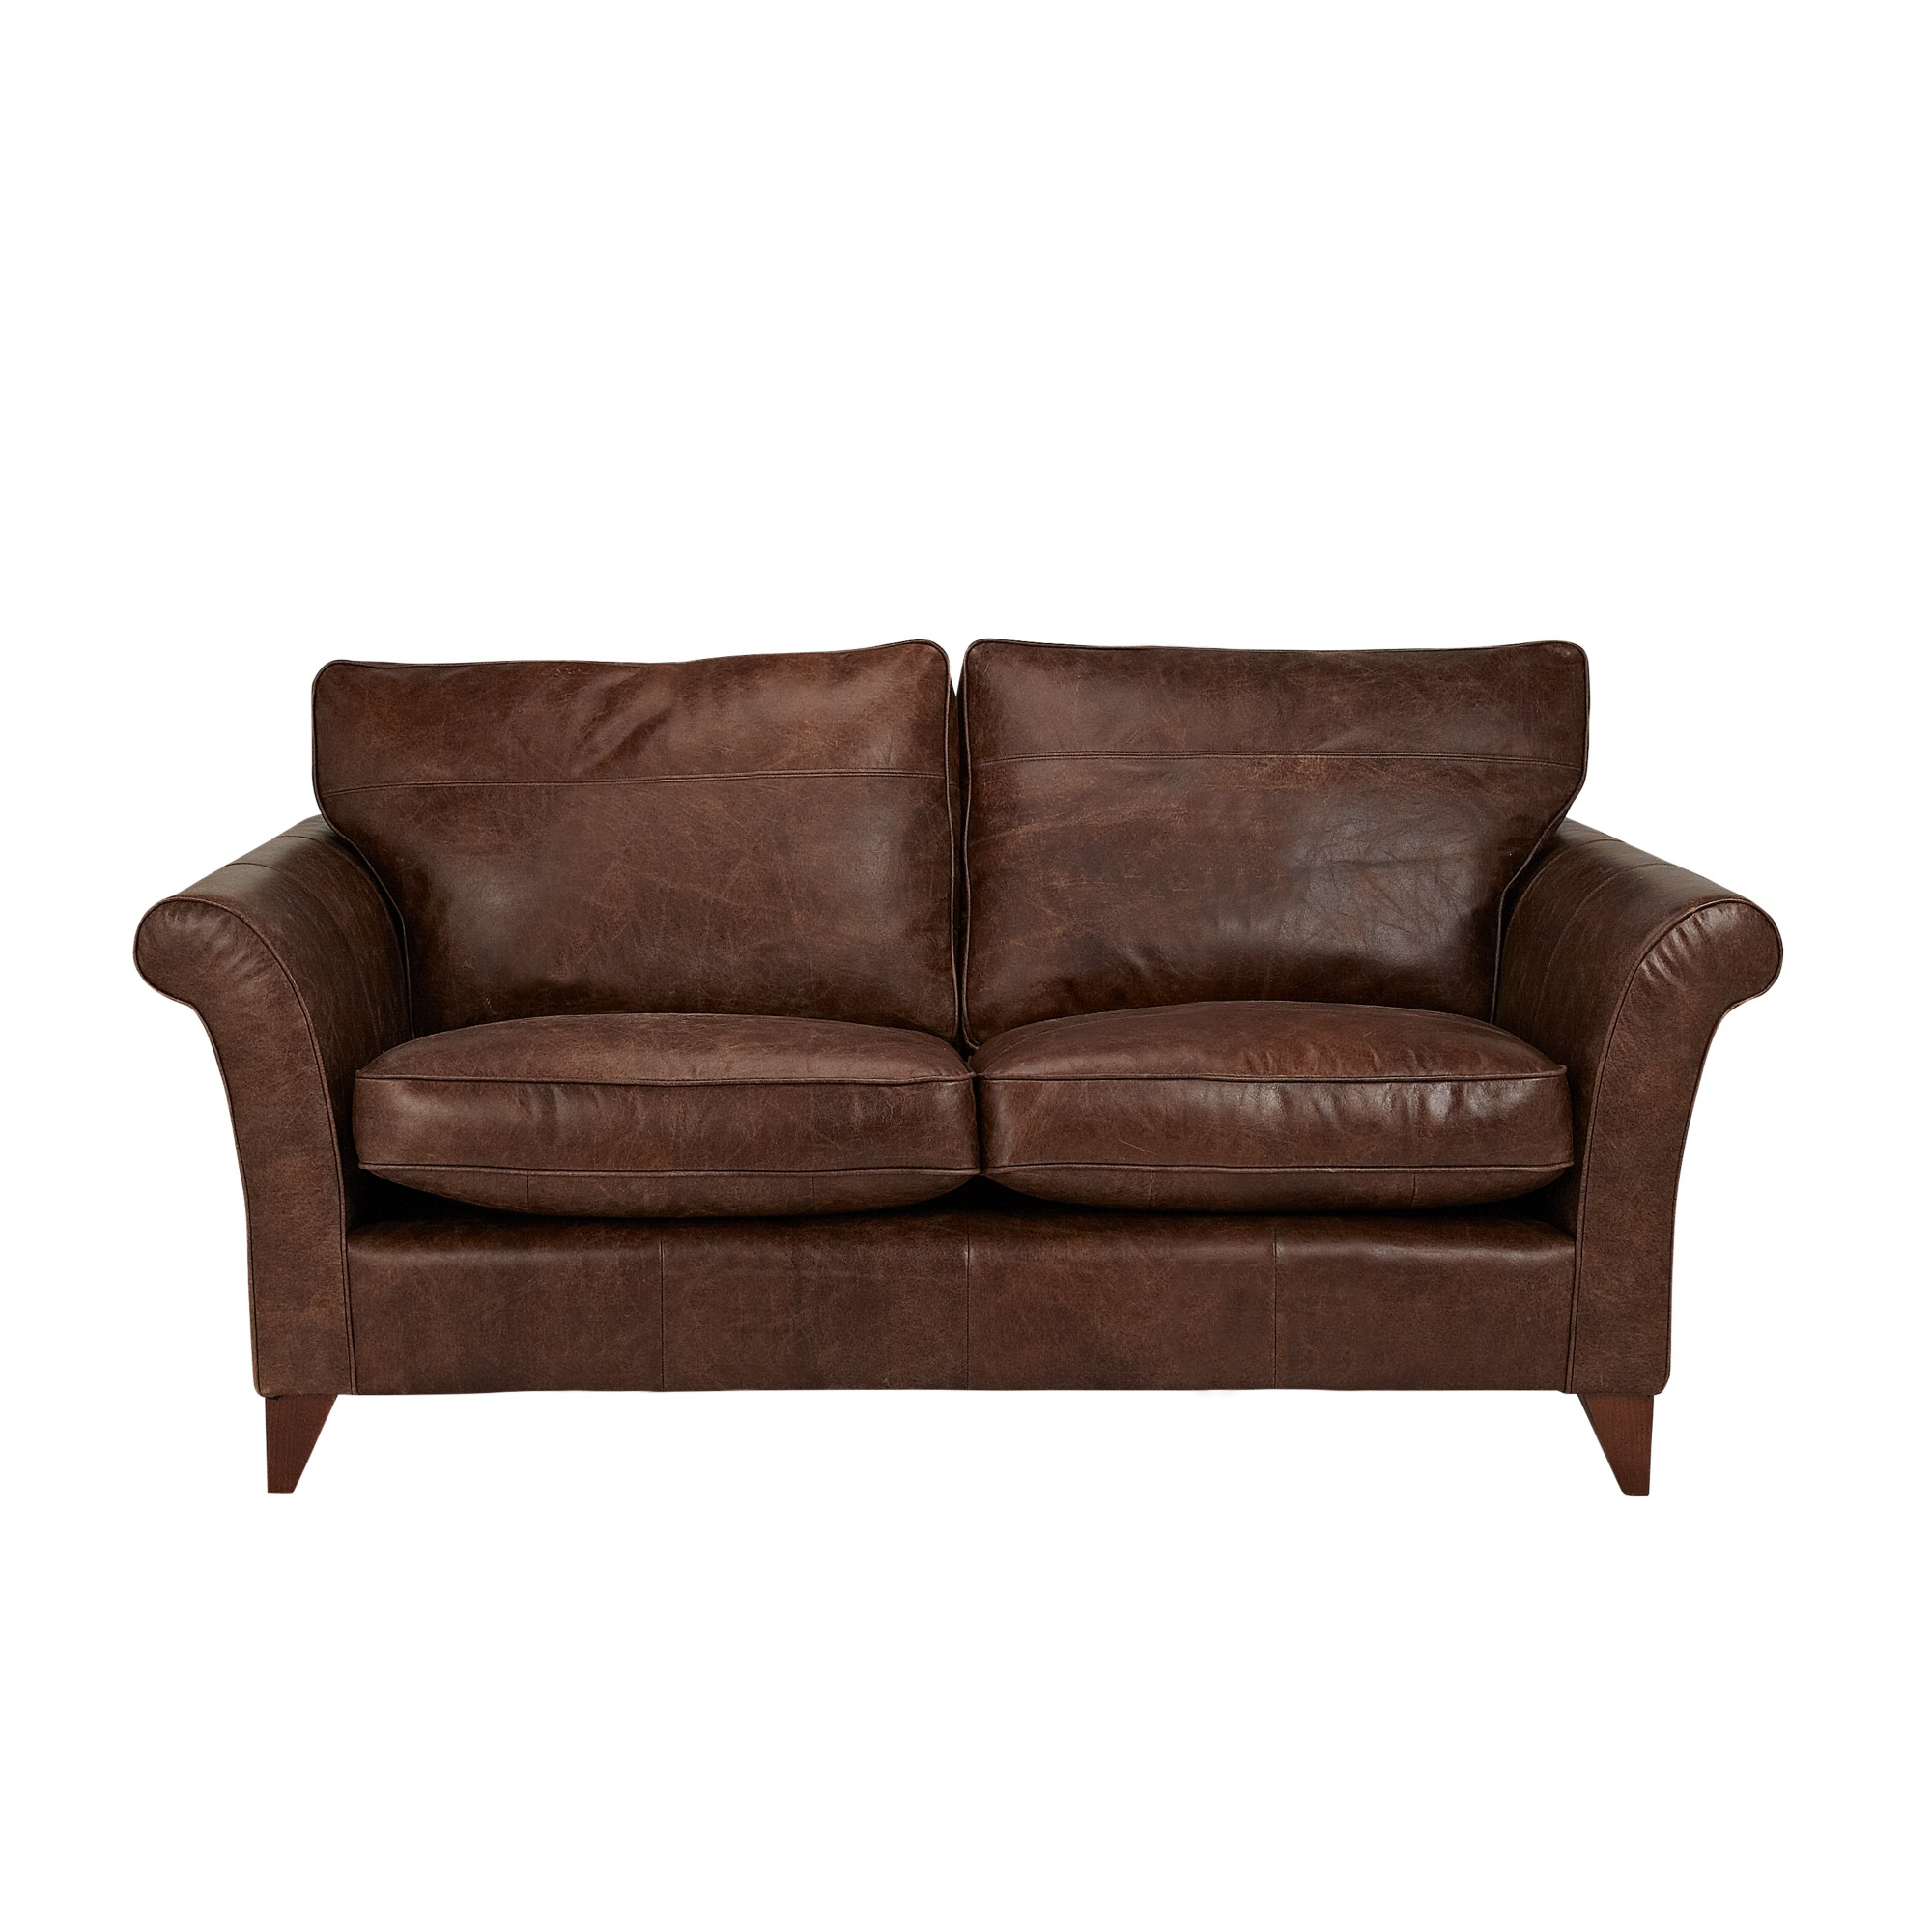 rialto sofa bed mainstays baja futon sleeper multiple colors john lewis charlotte leather large bruno